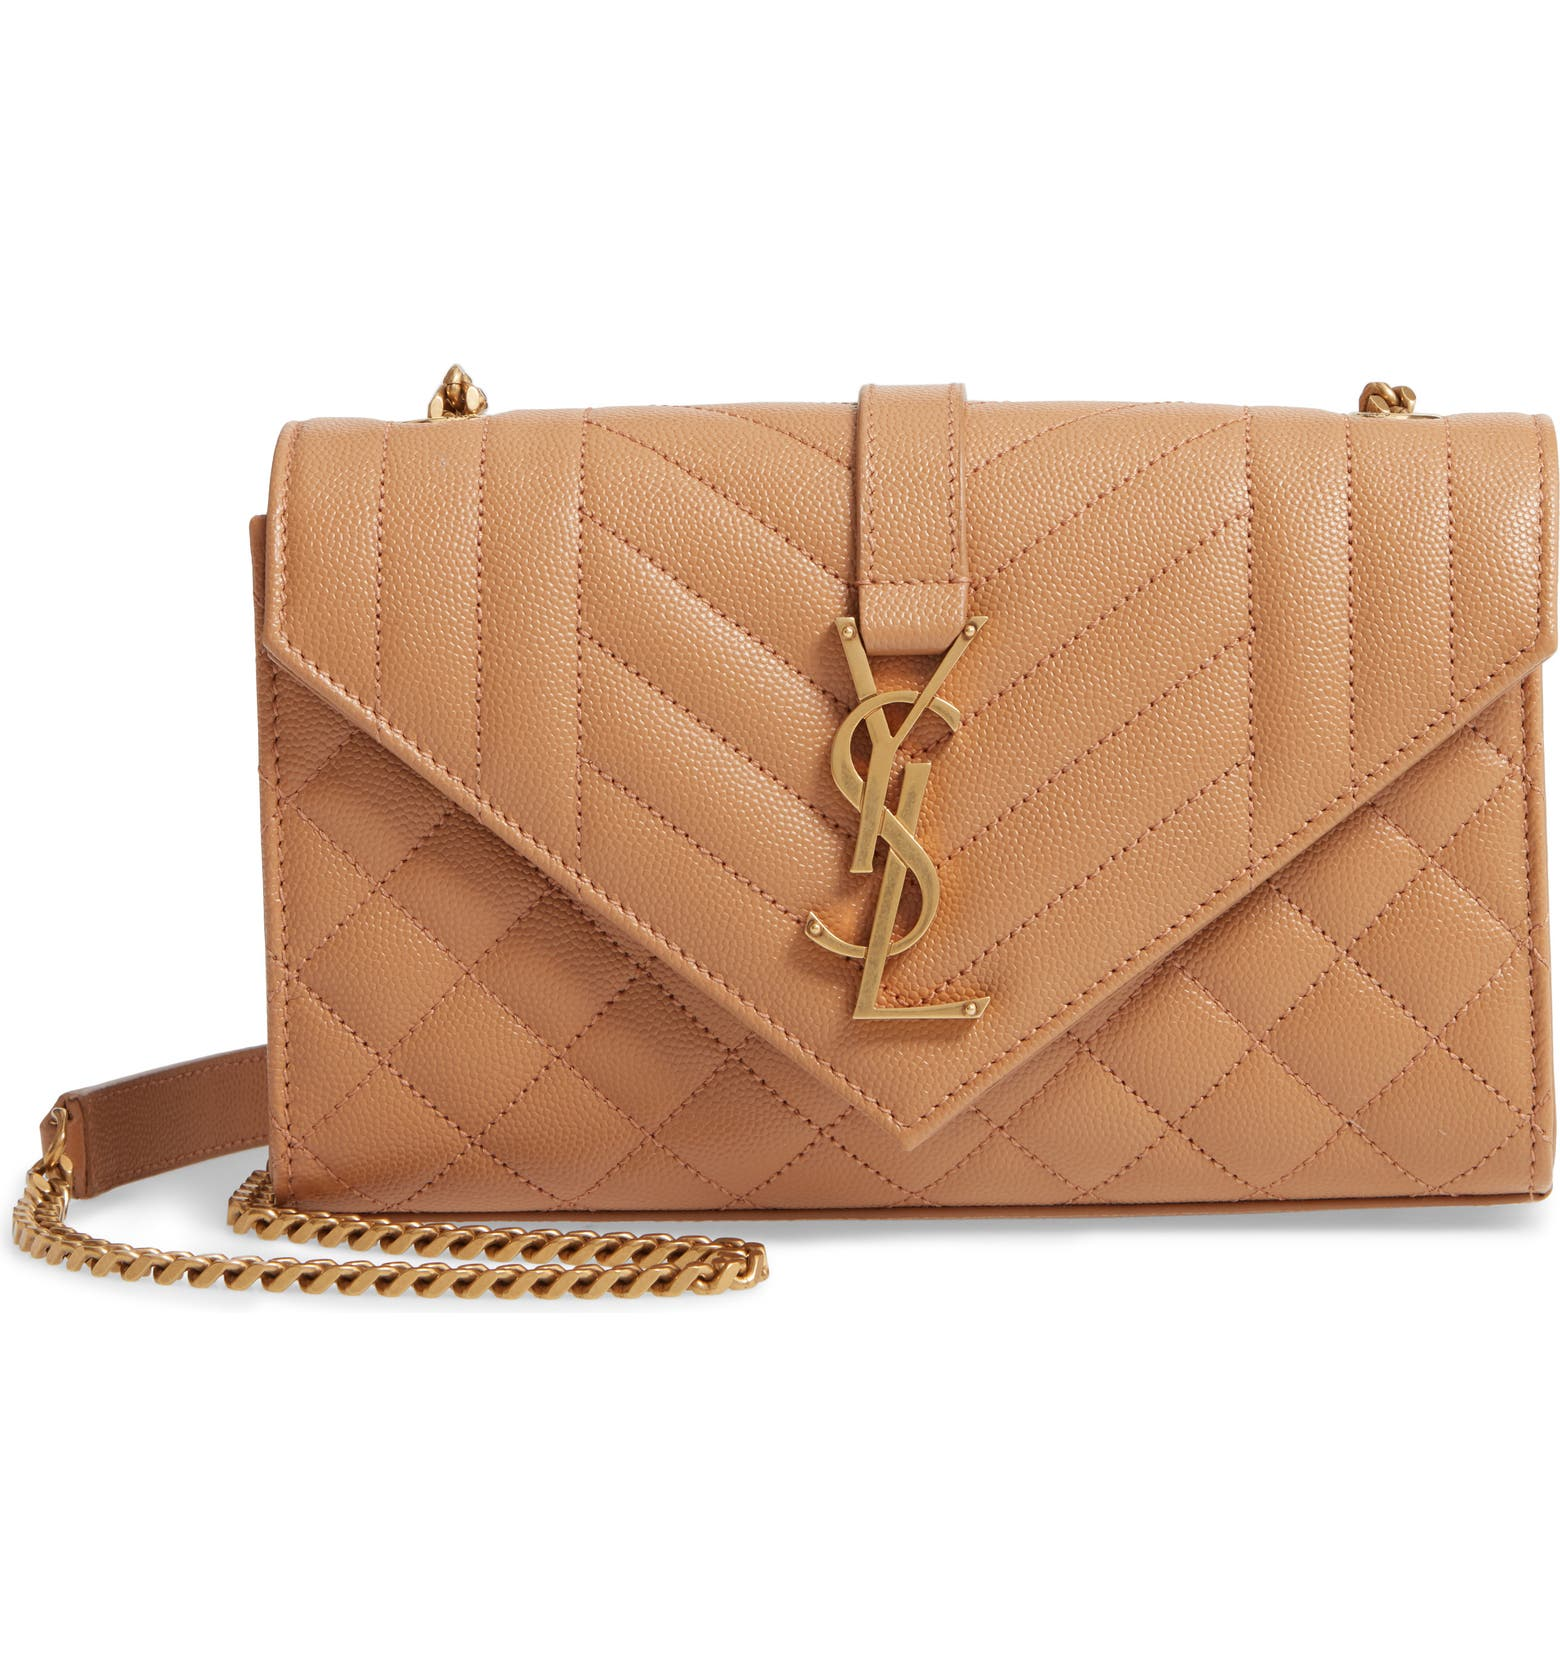 Small Monogramme Matelassé Quilted Calfskin Shoulder Bag SAINT LAURENT